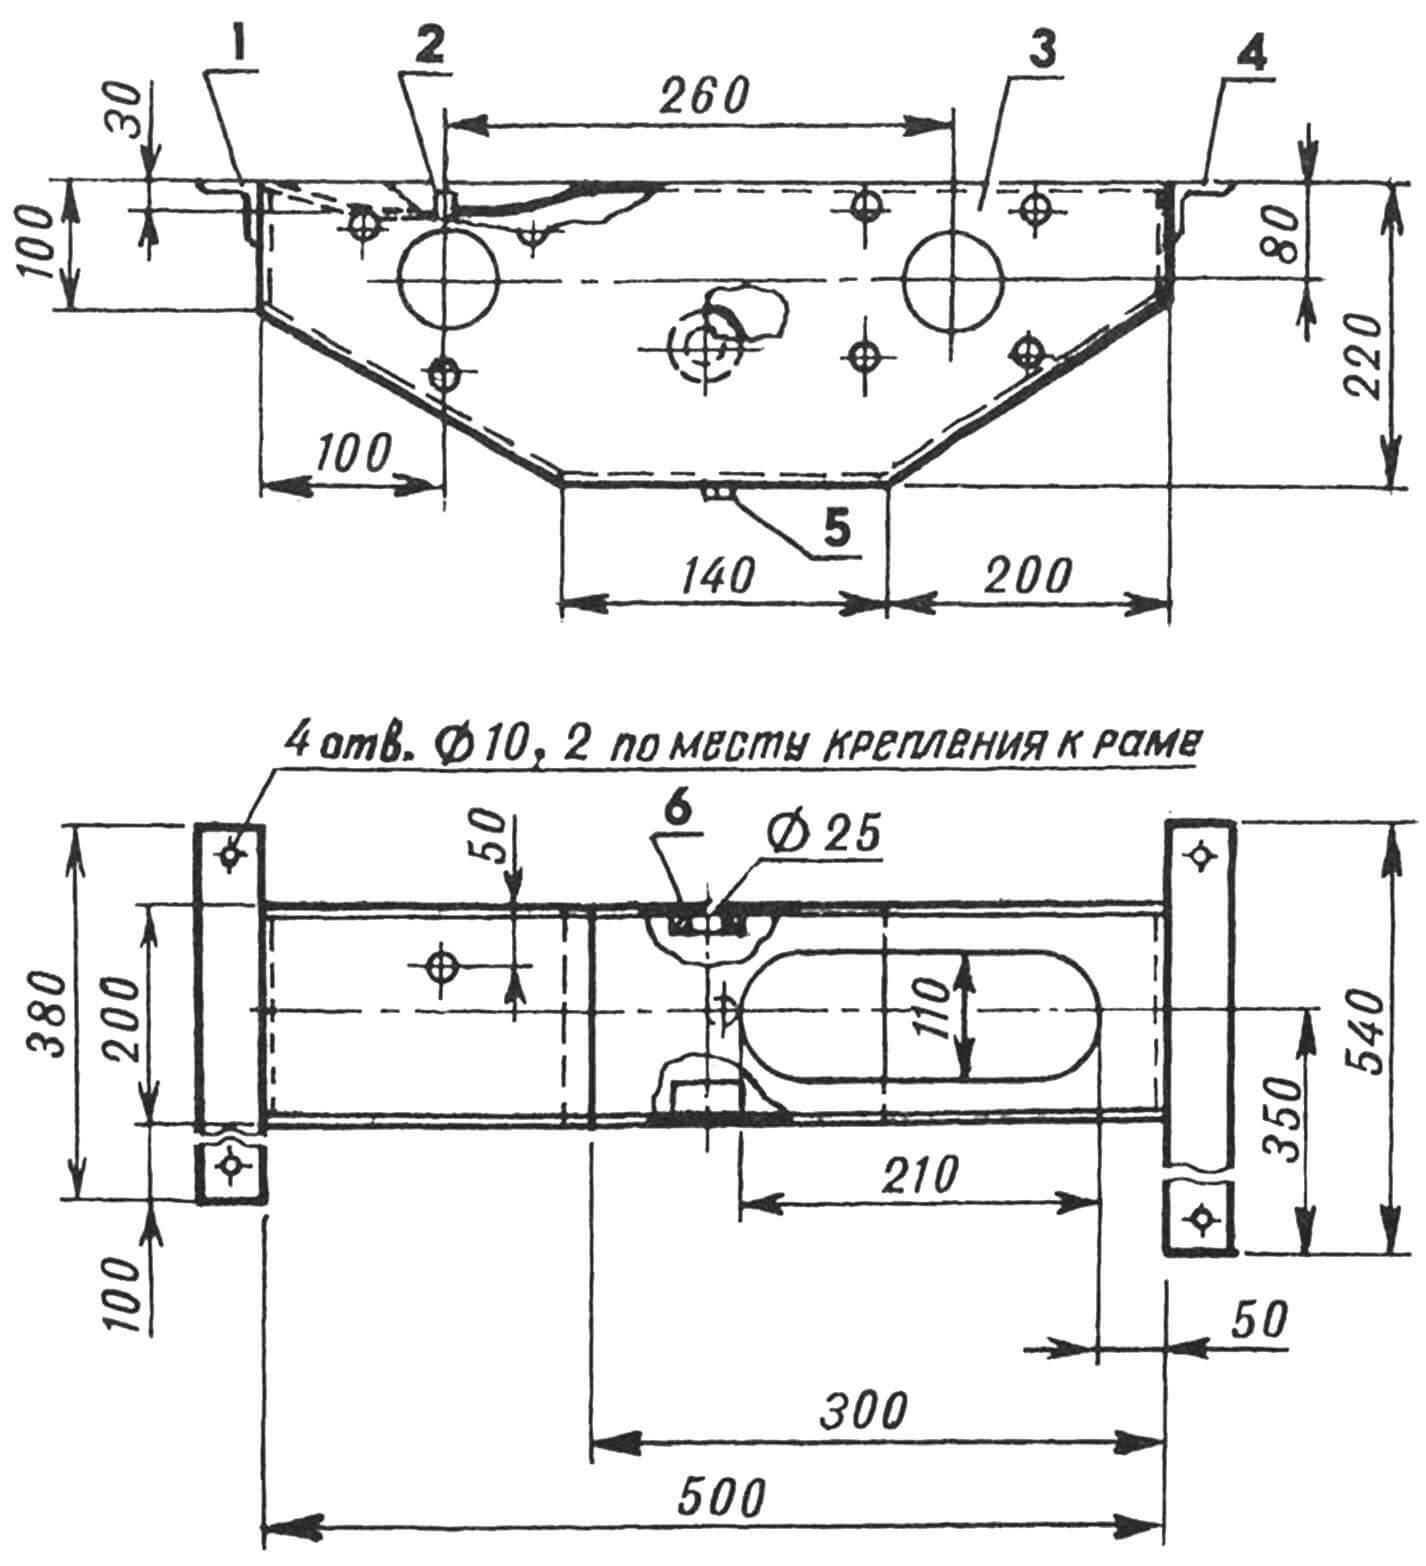 Корпус редуктора (крышка монтажного люка снята)